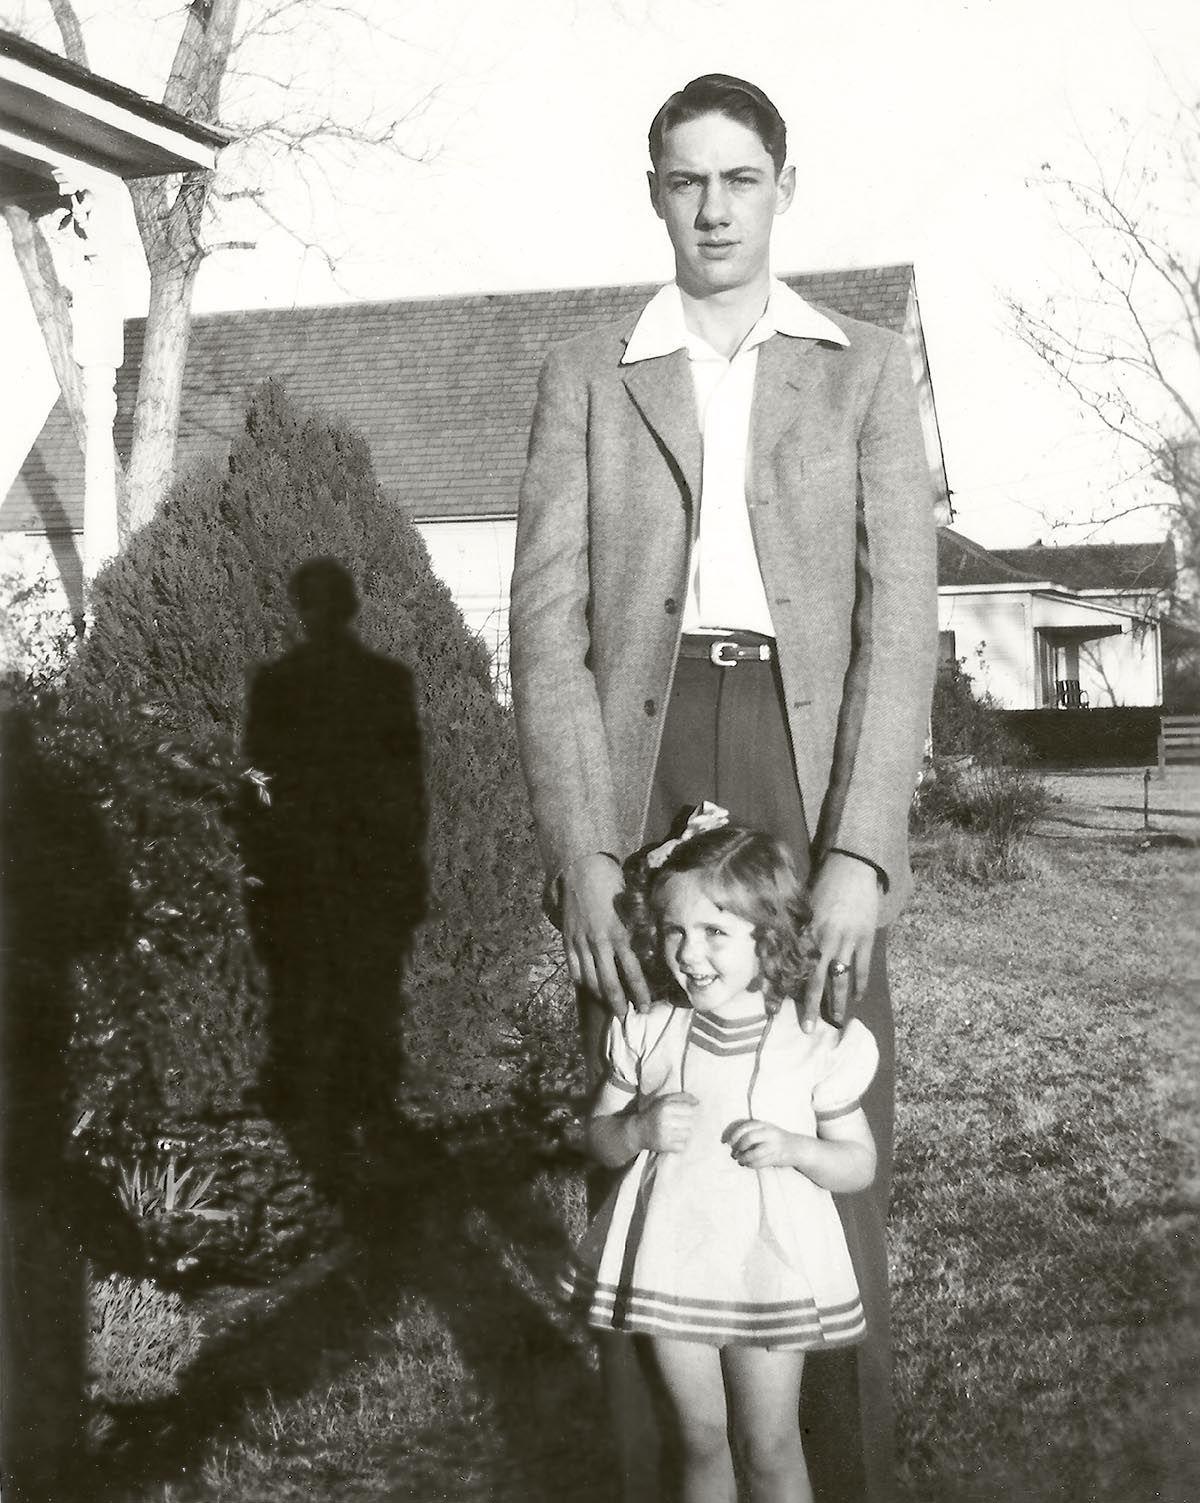 Maurice and Sandra Paschall, about 1942, Bridgeport, Texas